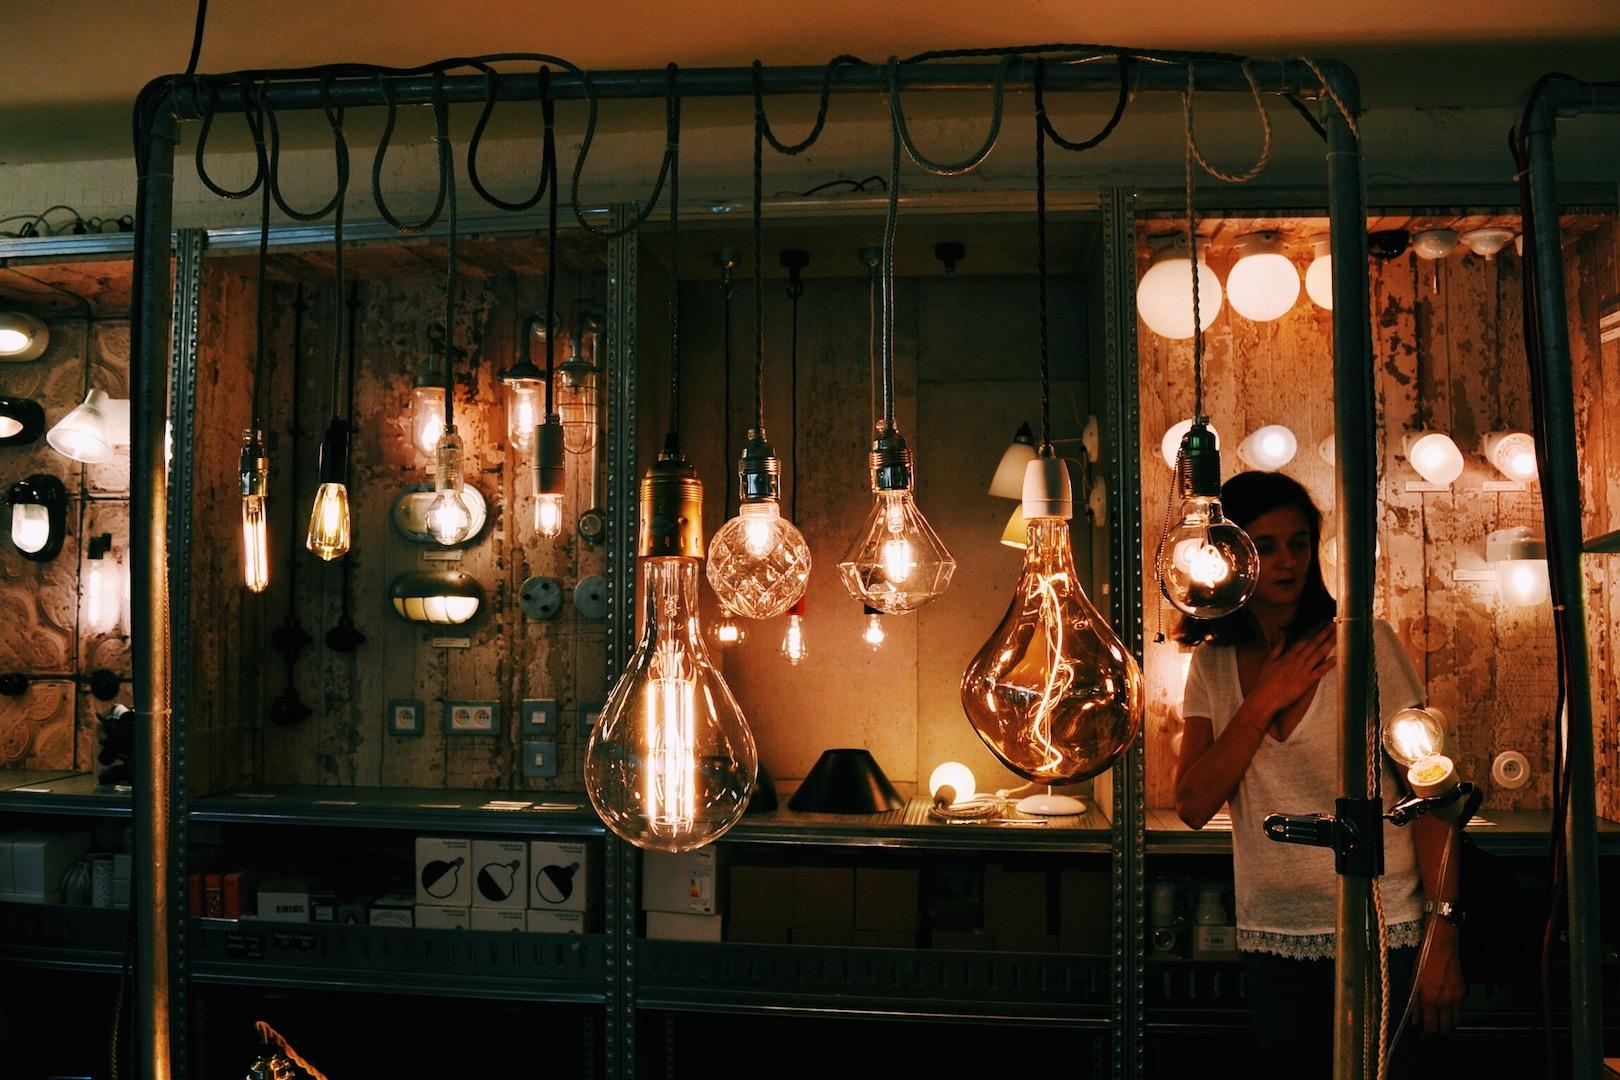 lights-merci-paris.JPG